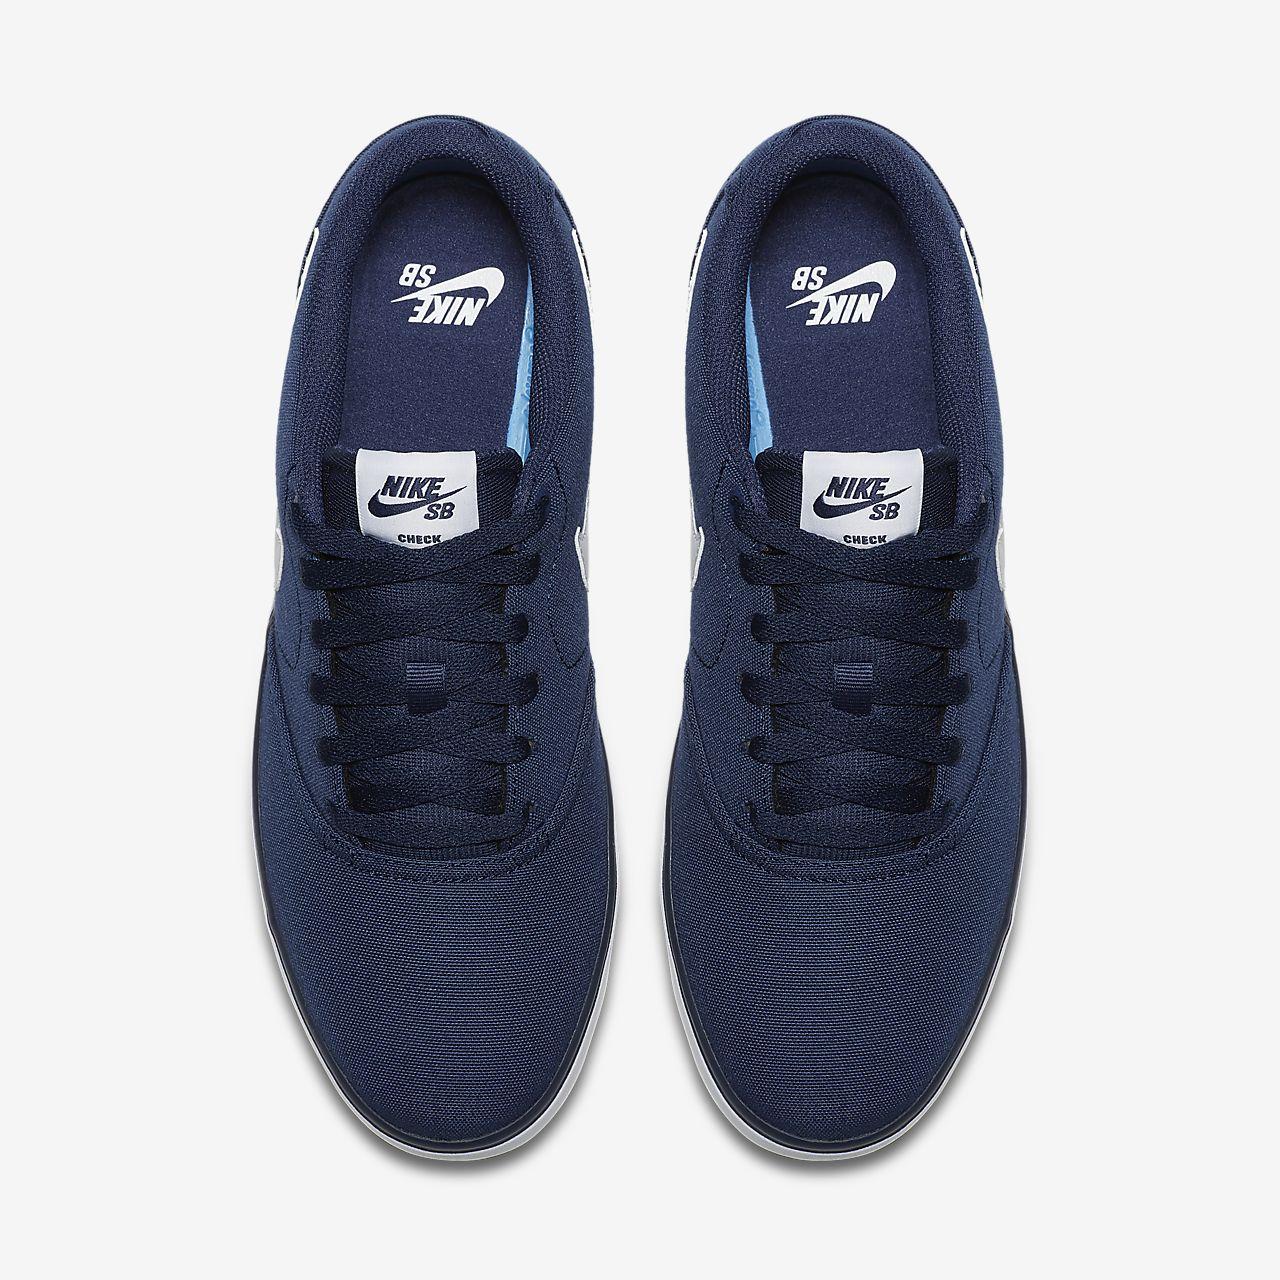 a1cefe068003 Nike SB Check Solarsoft Canvas Men s Skateboarding Shoe. Nike.com LU